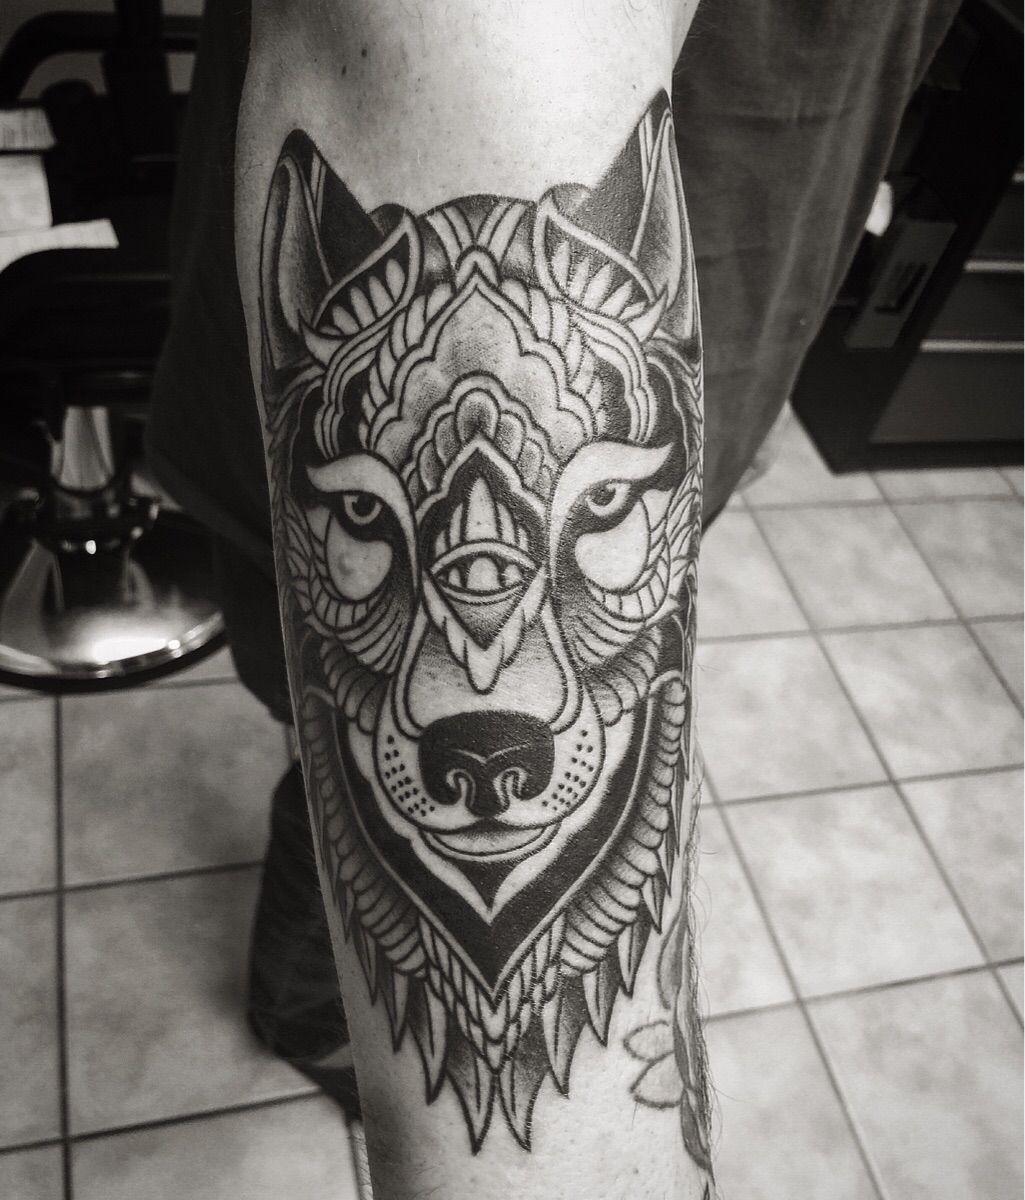 Tattoo motiv wolf tattoovorlage wolfskopf - Mandala Wolf Tattoo